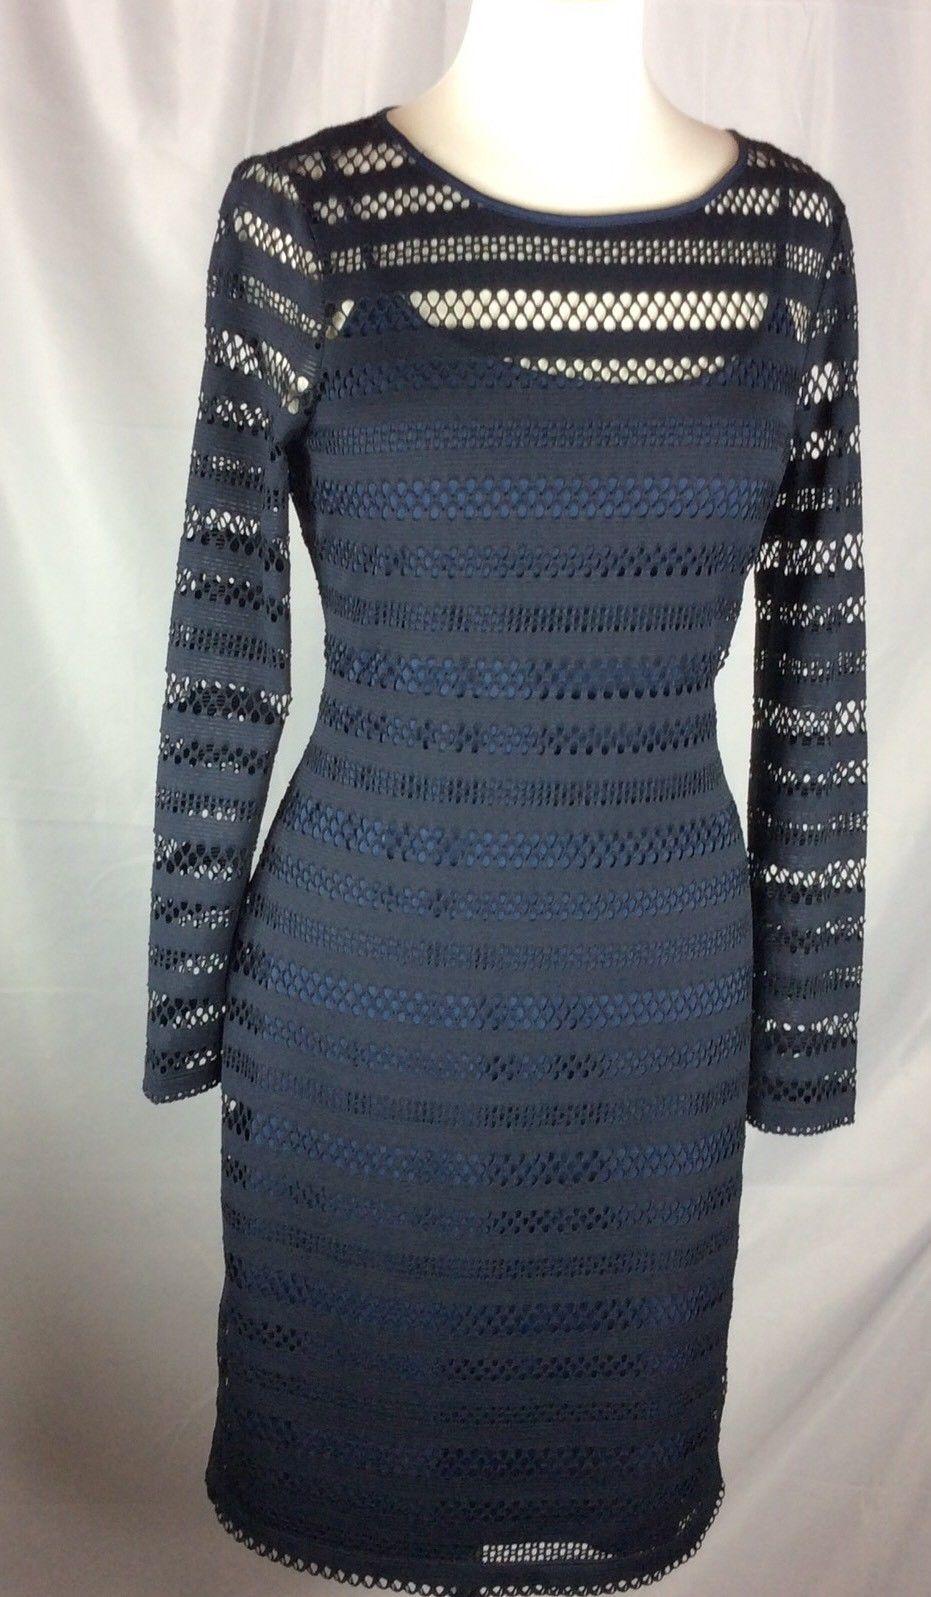 Awesome great marc new york andrew marc sz medium womenus lace black